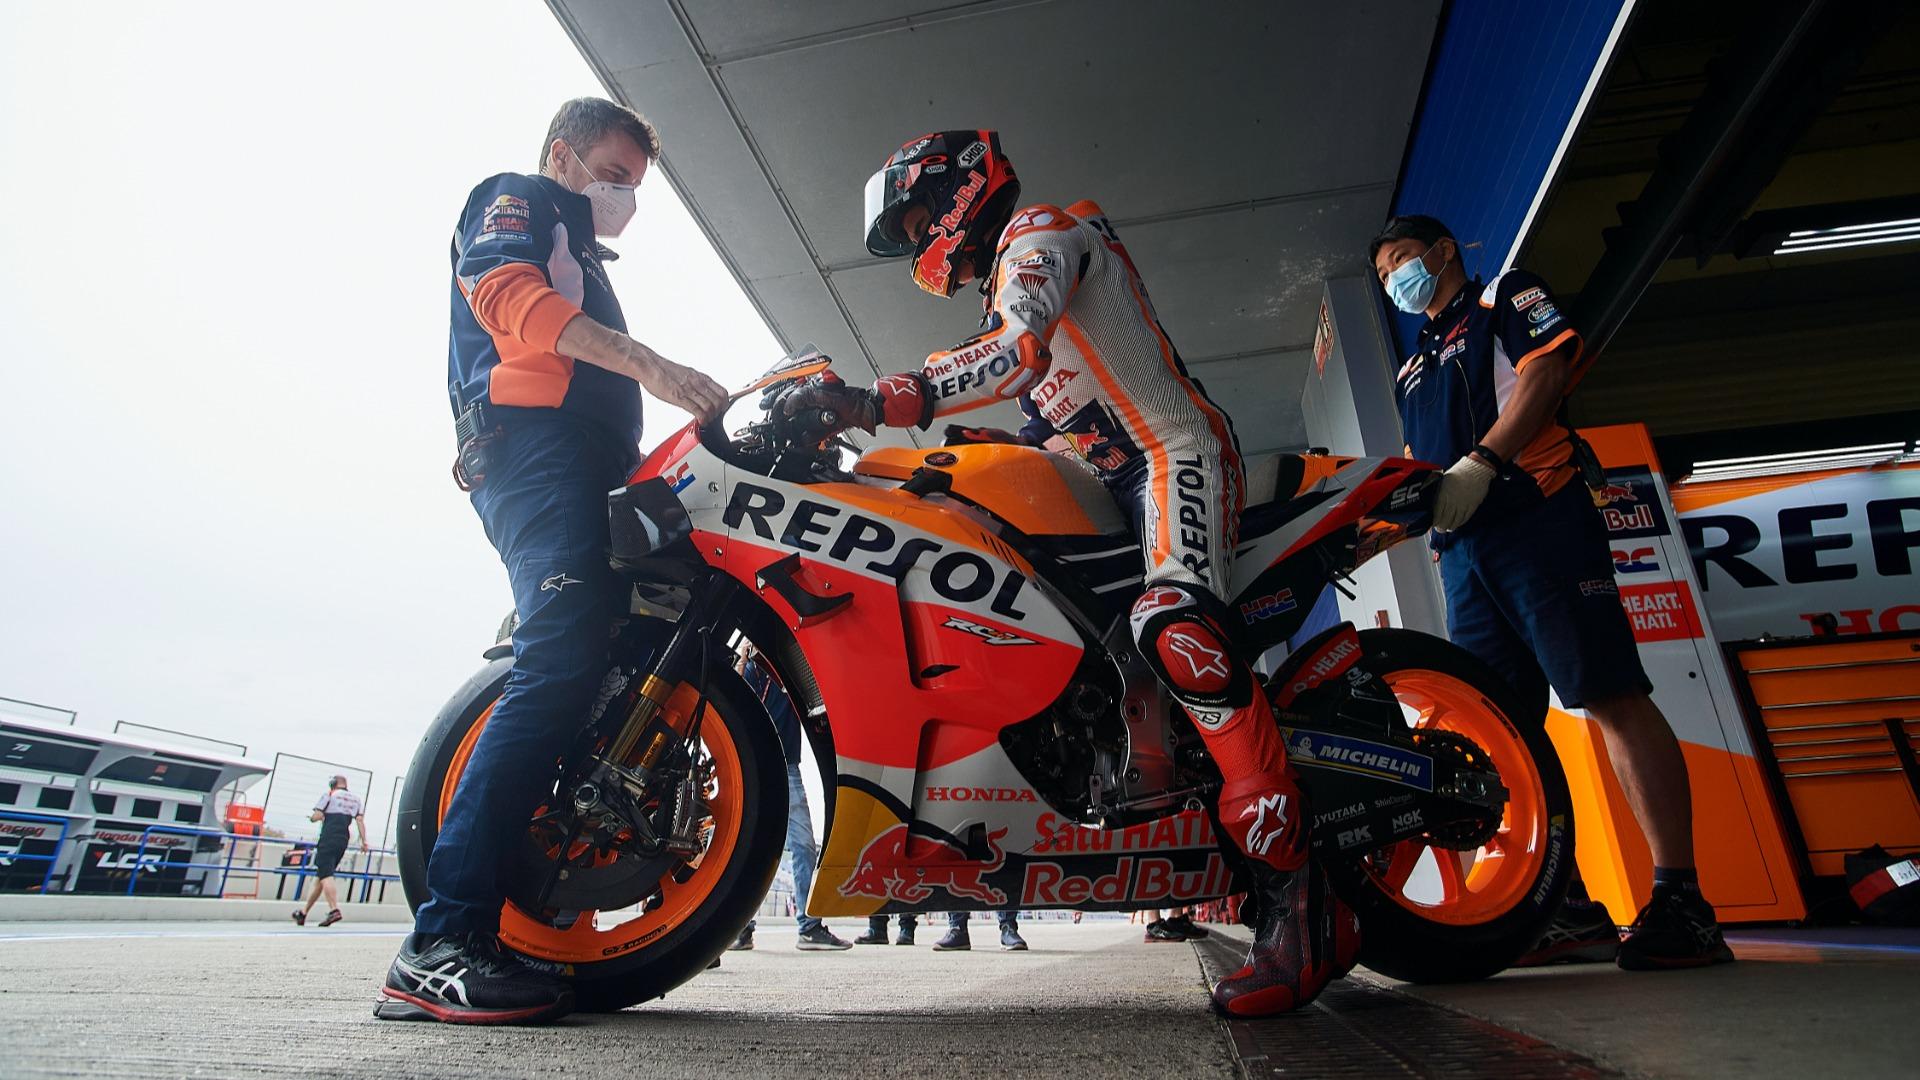 Marquez limited to seven laps at Jerez test after Spanish GP crash